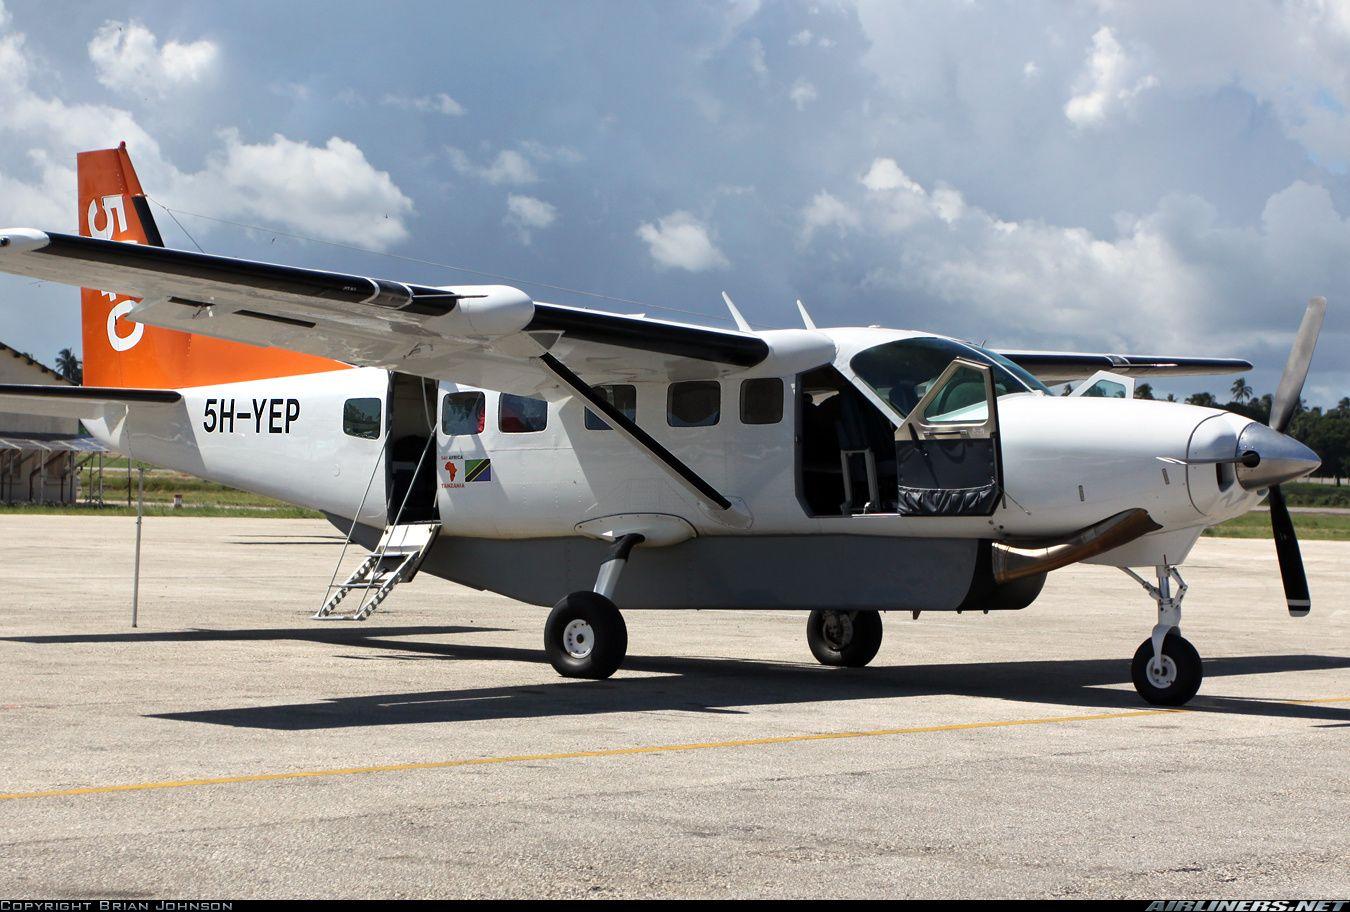 Cessna 208B Grand Caravan aircraft picture Cessna, Grand